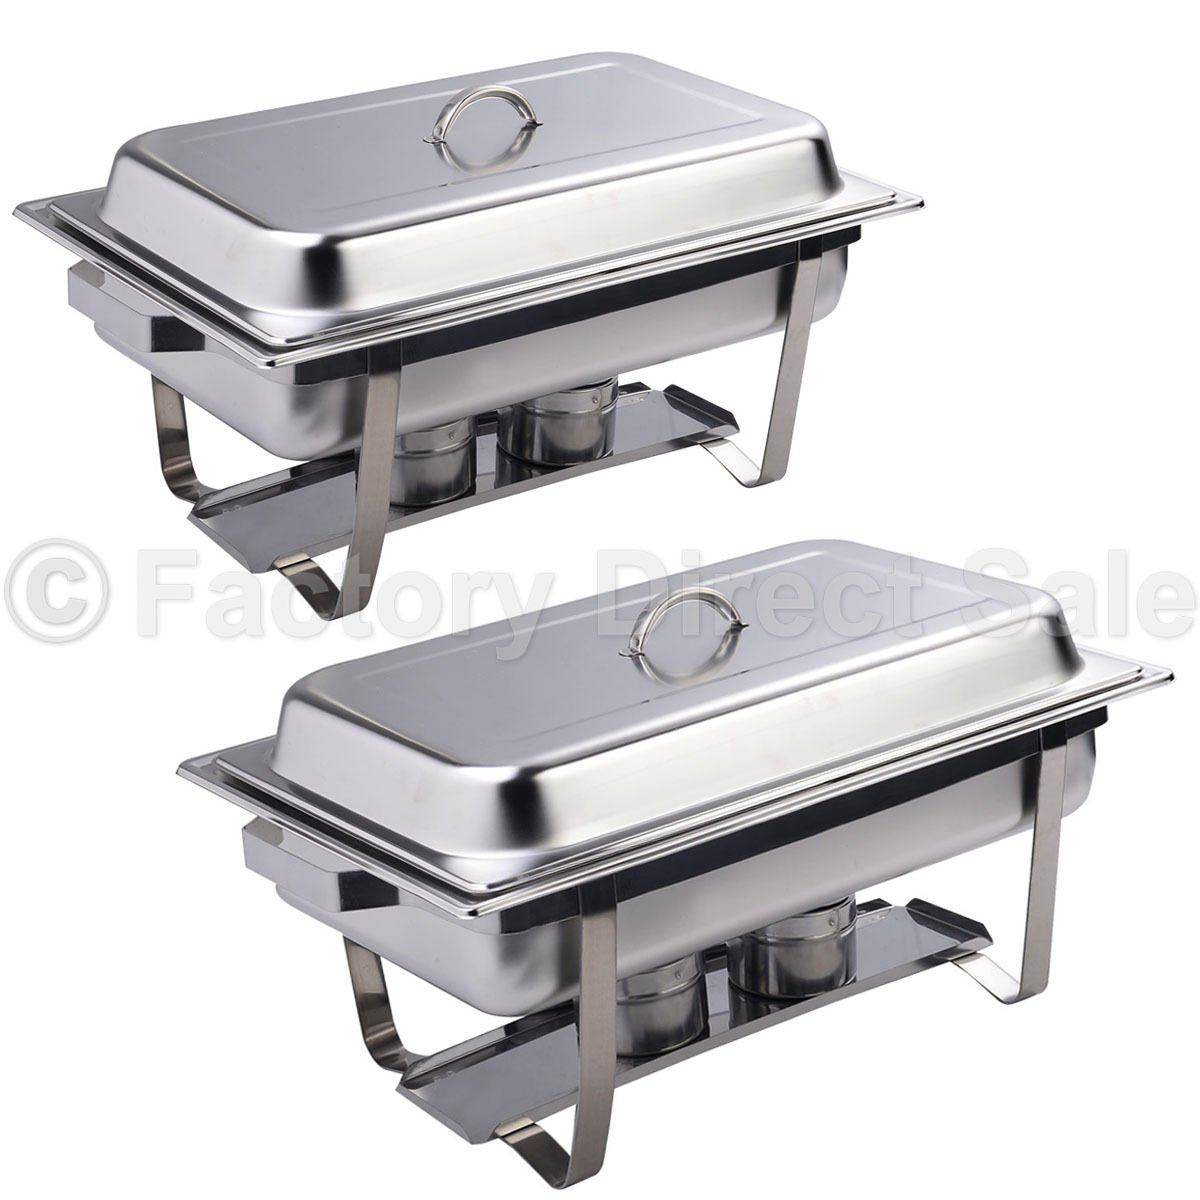 DPThouse 2 Pack Rectangular Chafing Dish Stainless Steel Full Size 9 Quart